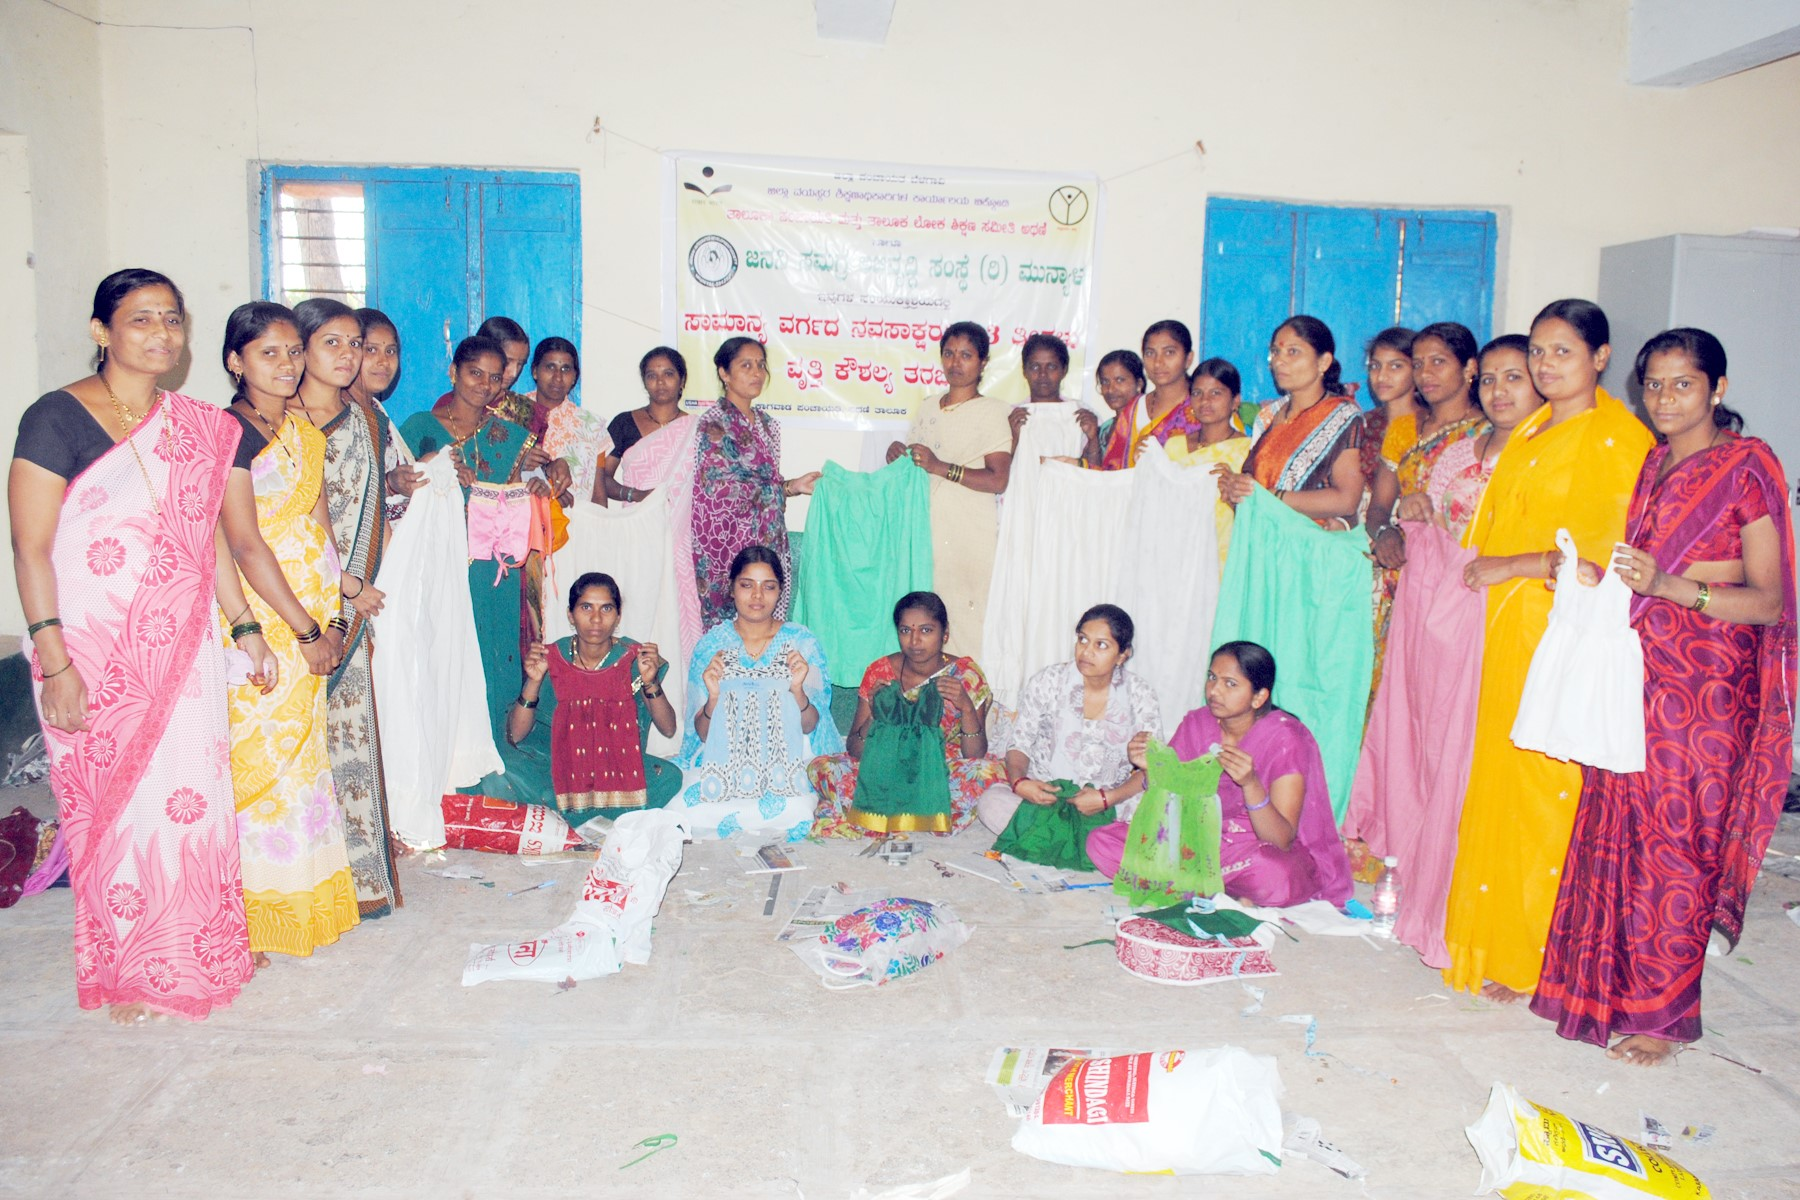 /media/janani/1NGO-00255-Janani_Integrated_Development_Society_R-Activities-Skill_Training_Program.jpg